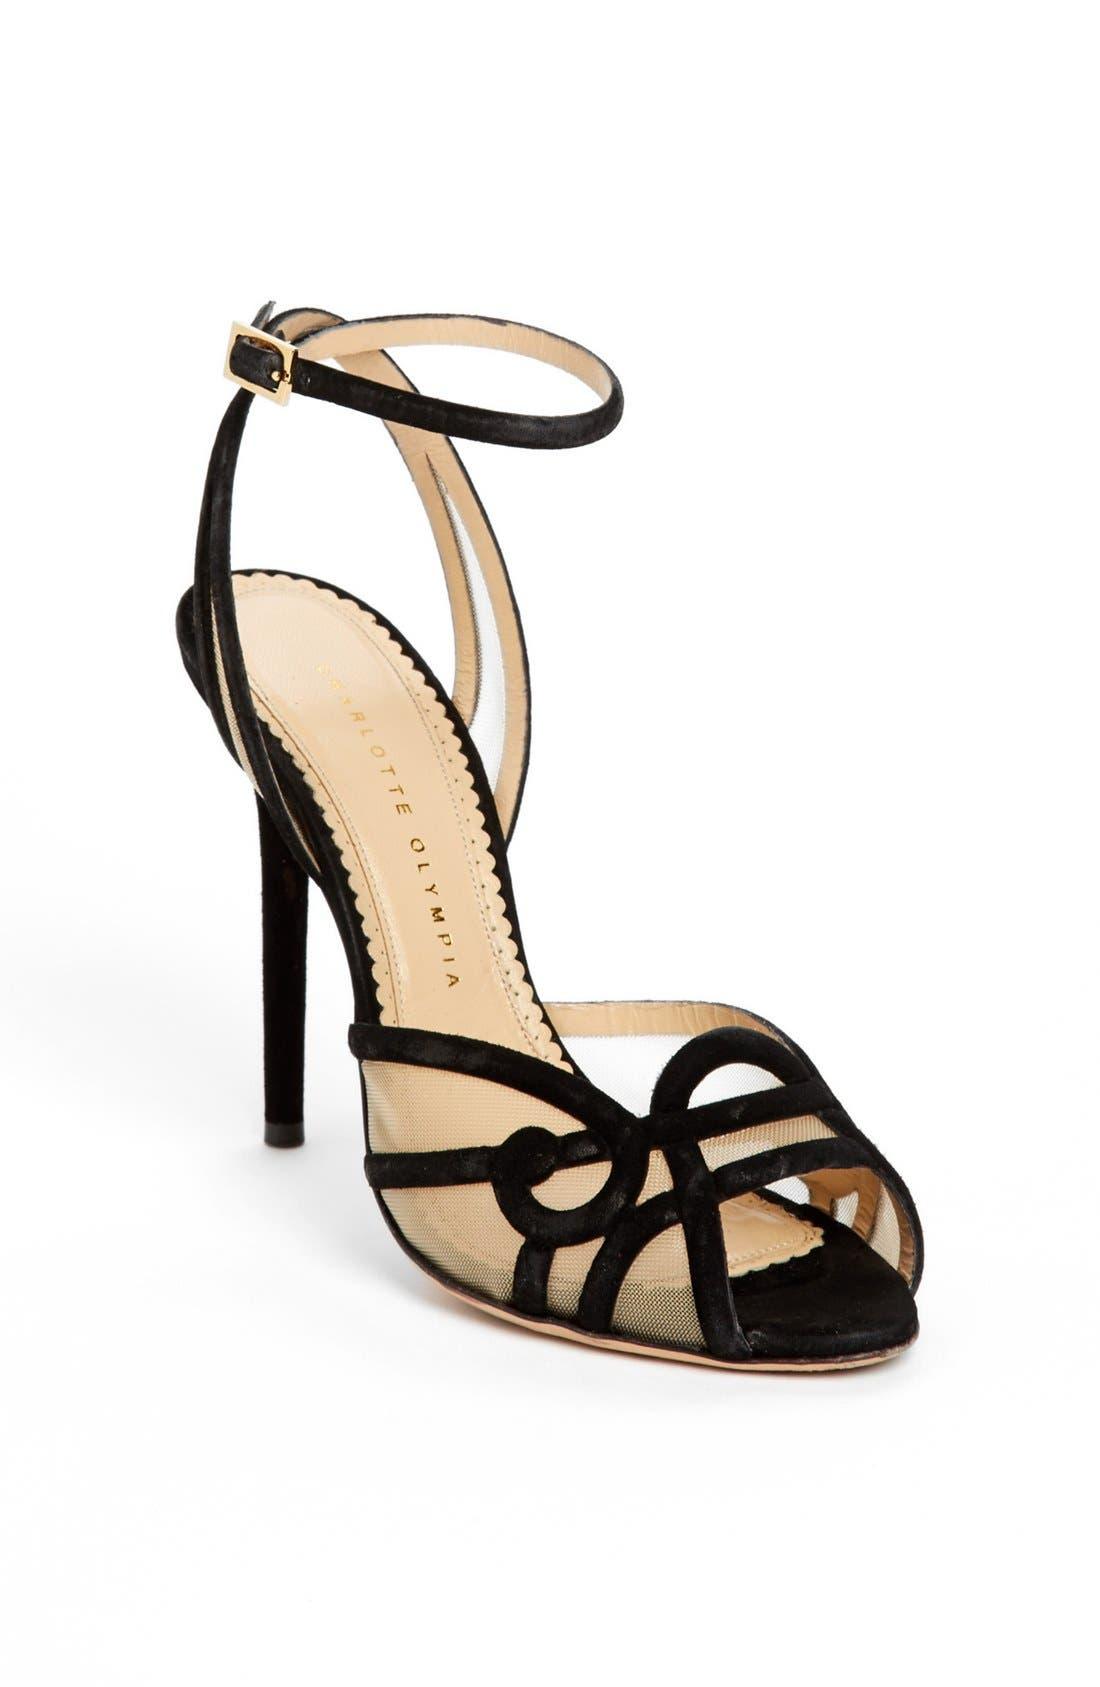 Main Image - Charlotte Olympia 'Sugar' High Strap Sandal